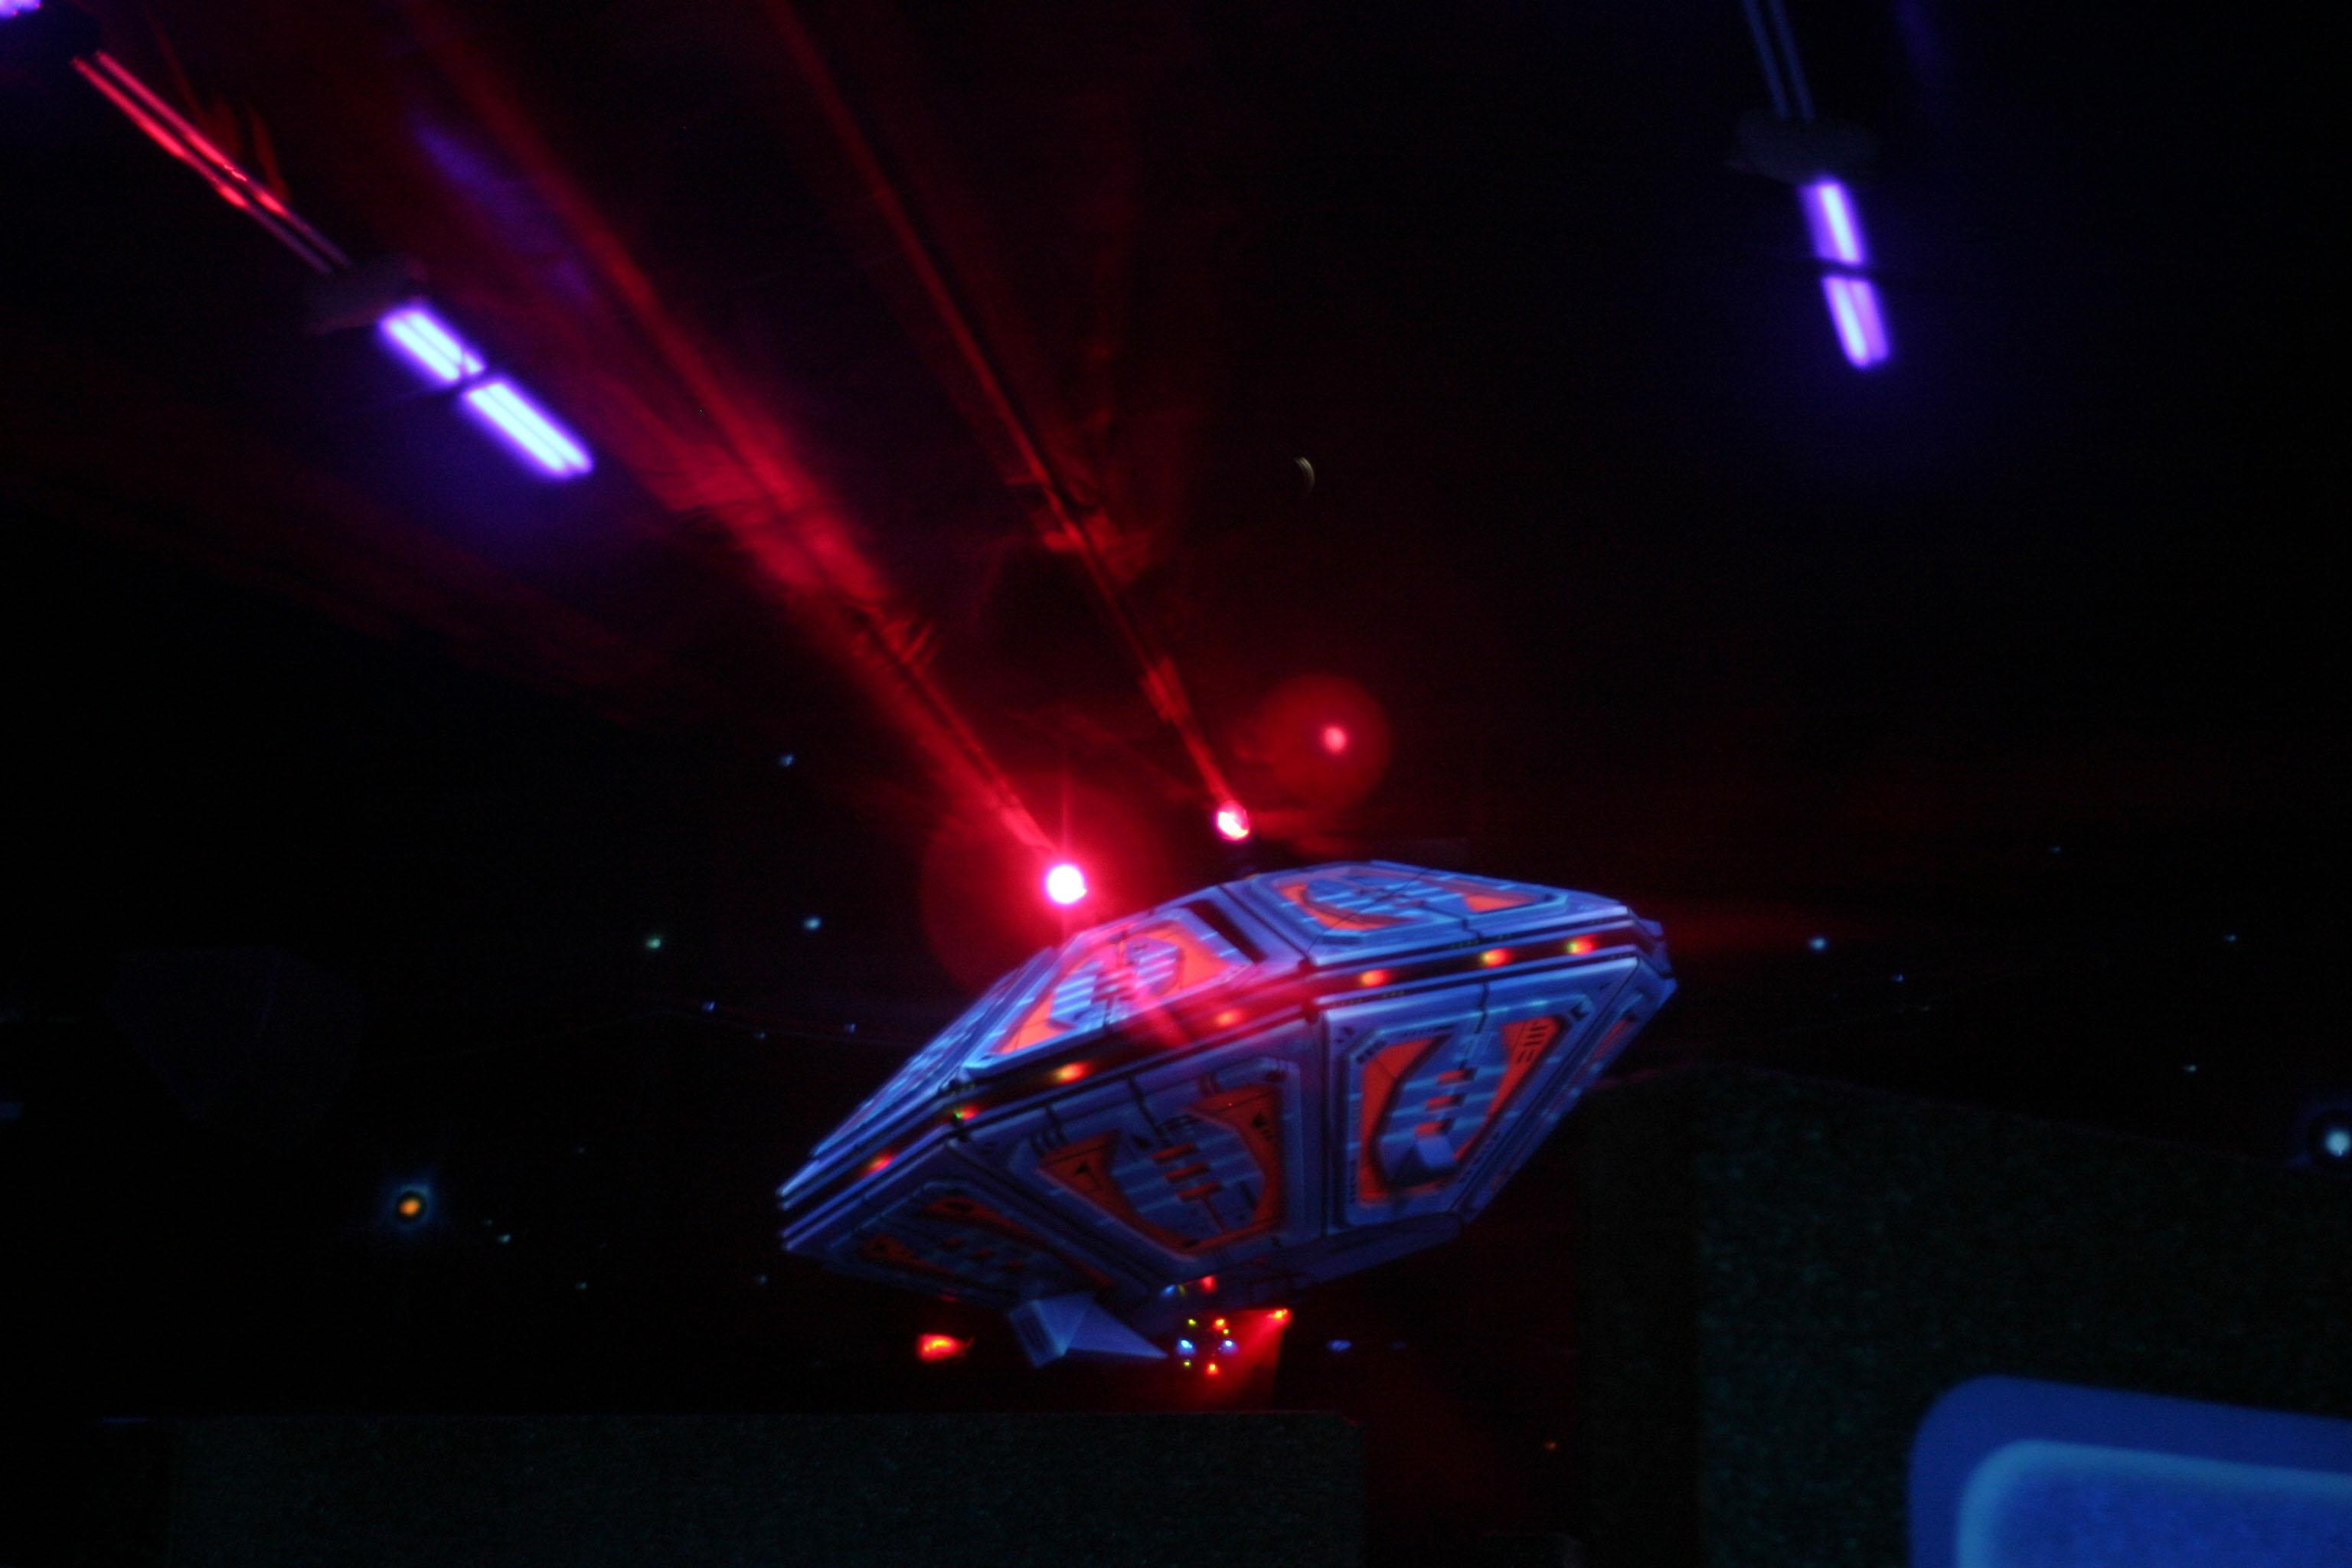 Laser Tag target